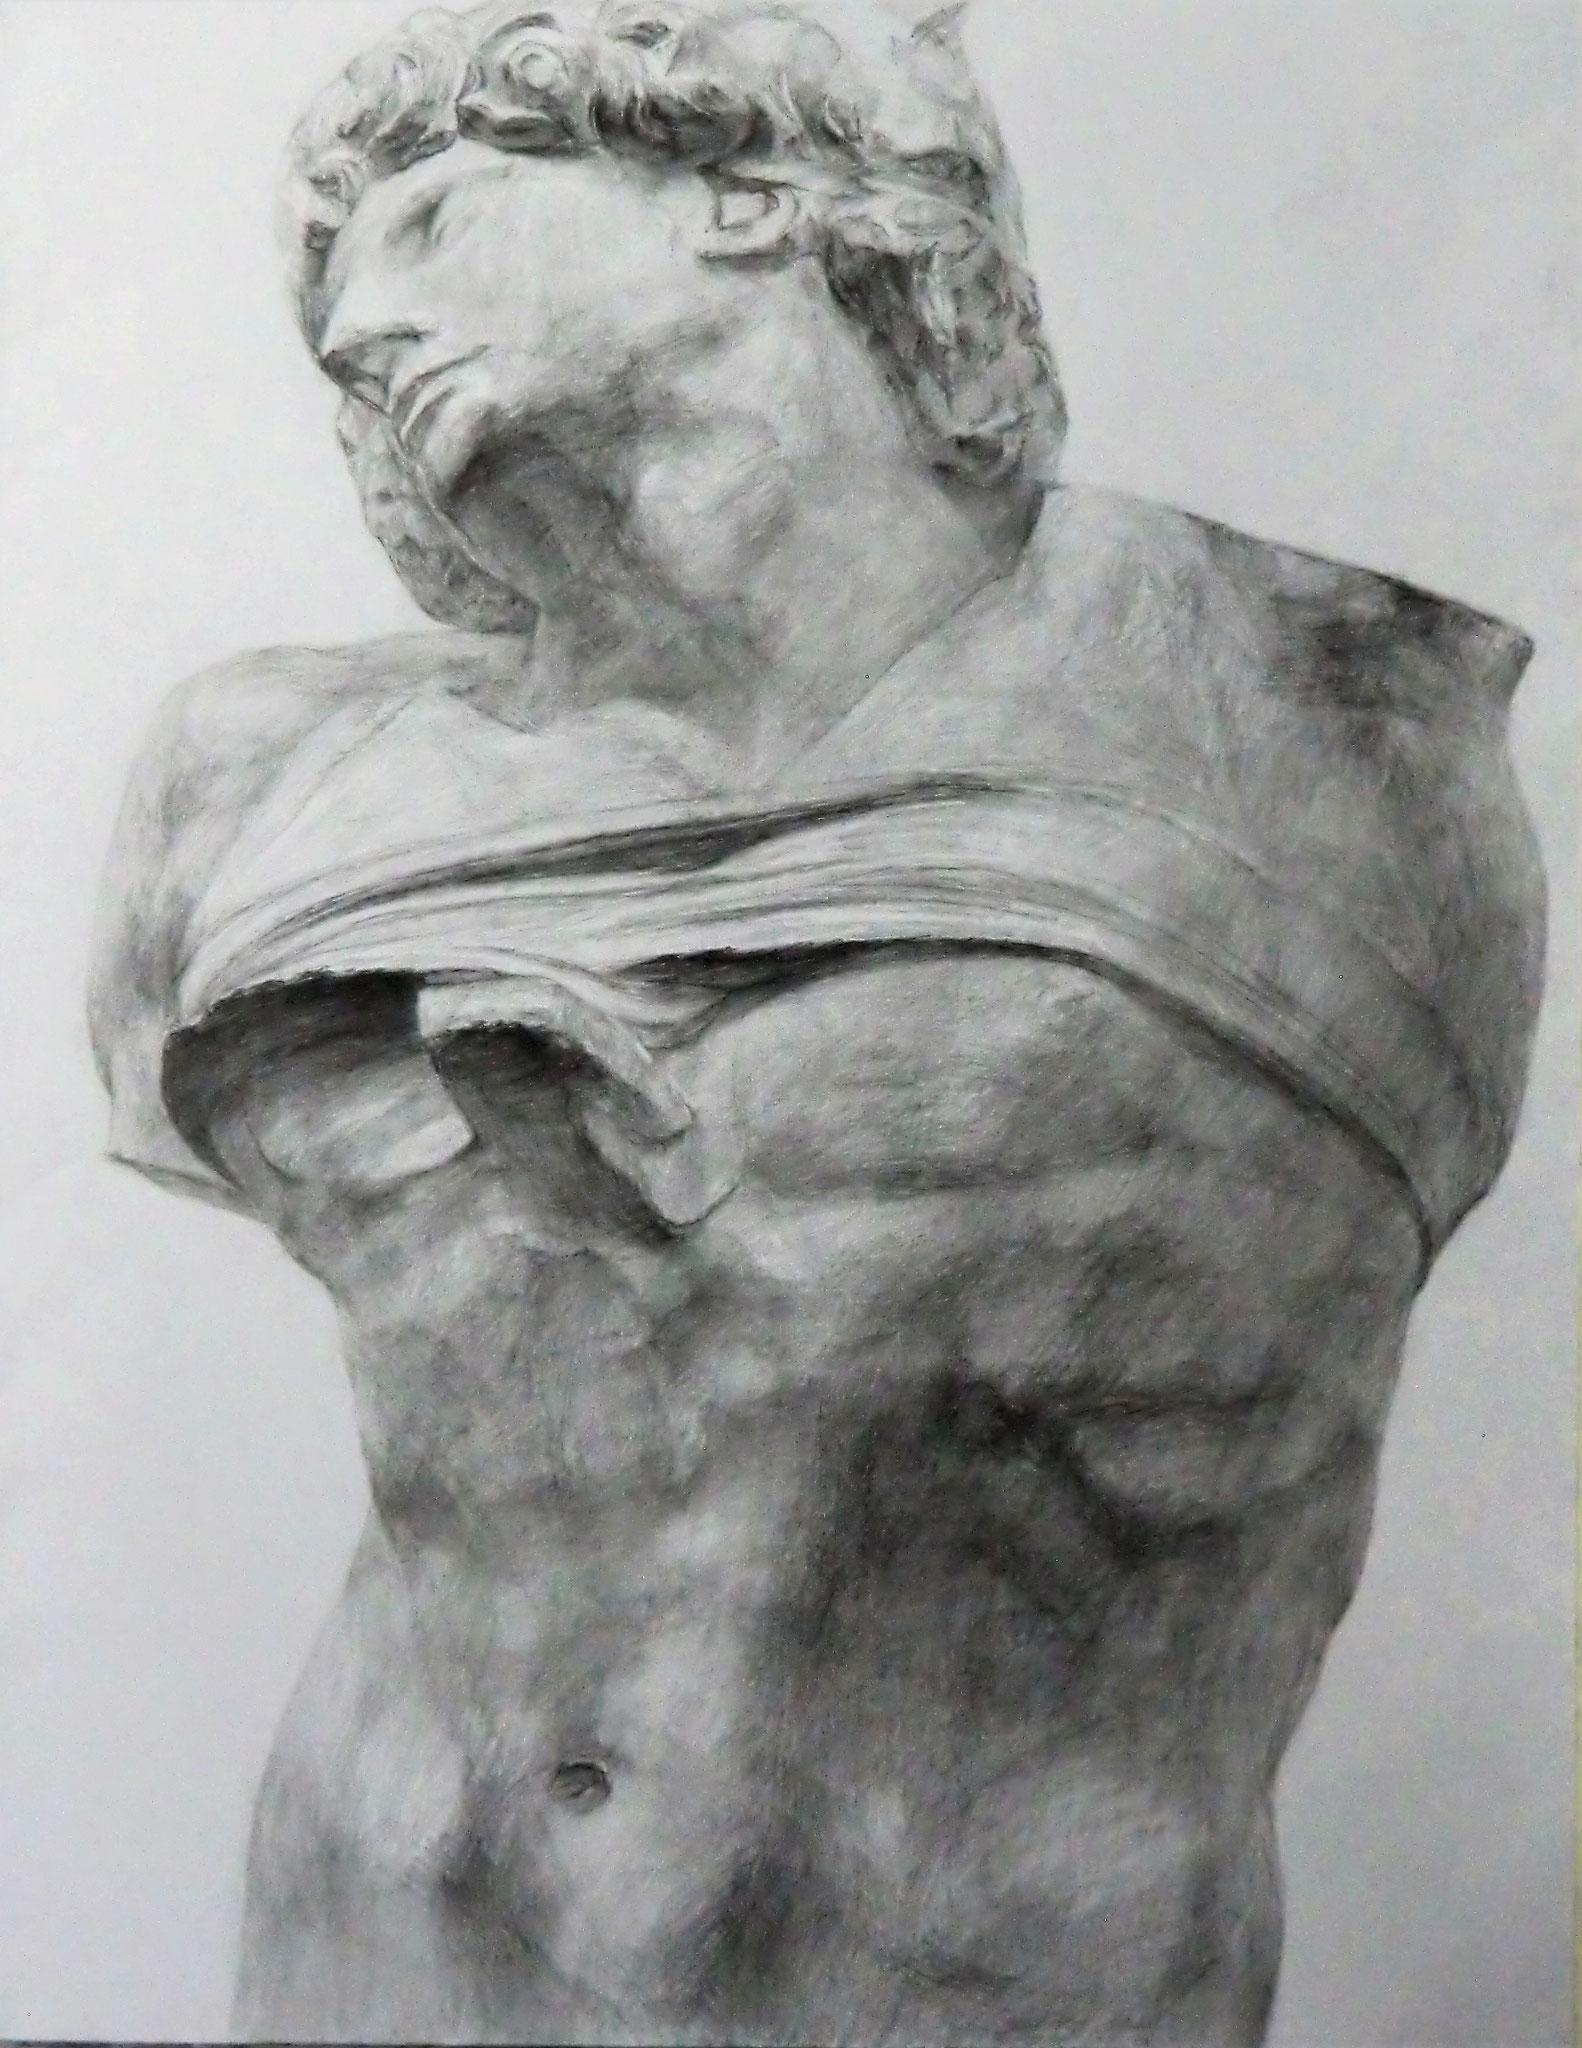 生徒作品6 鉛筆デッサン<奴隷半身像> 630×480mm 白象紙 【日本画系】